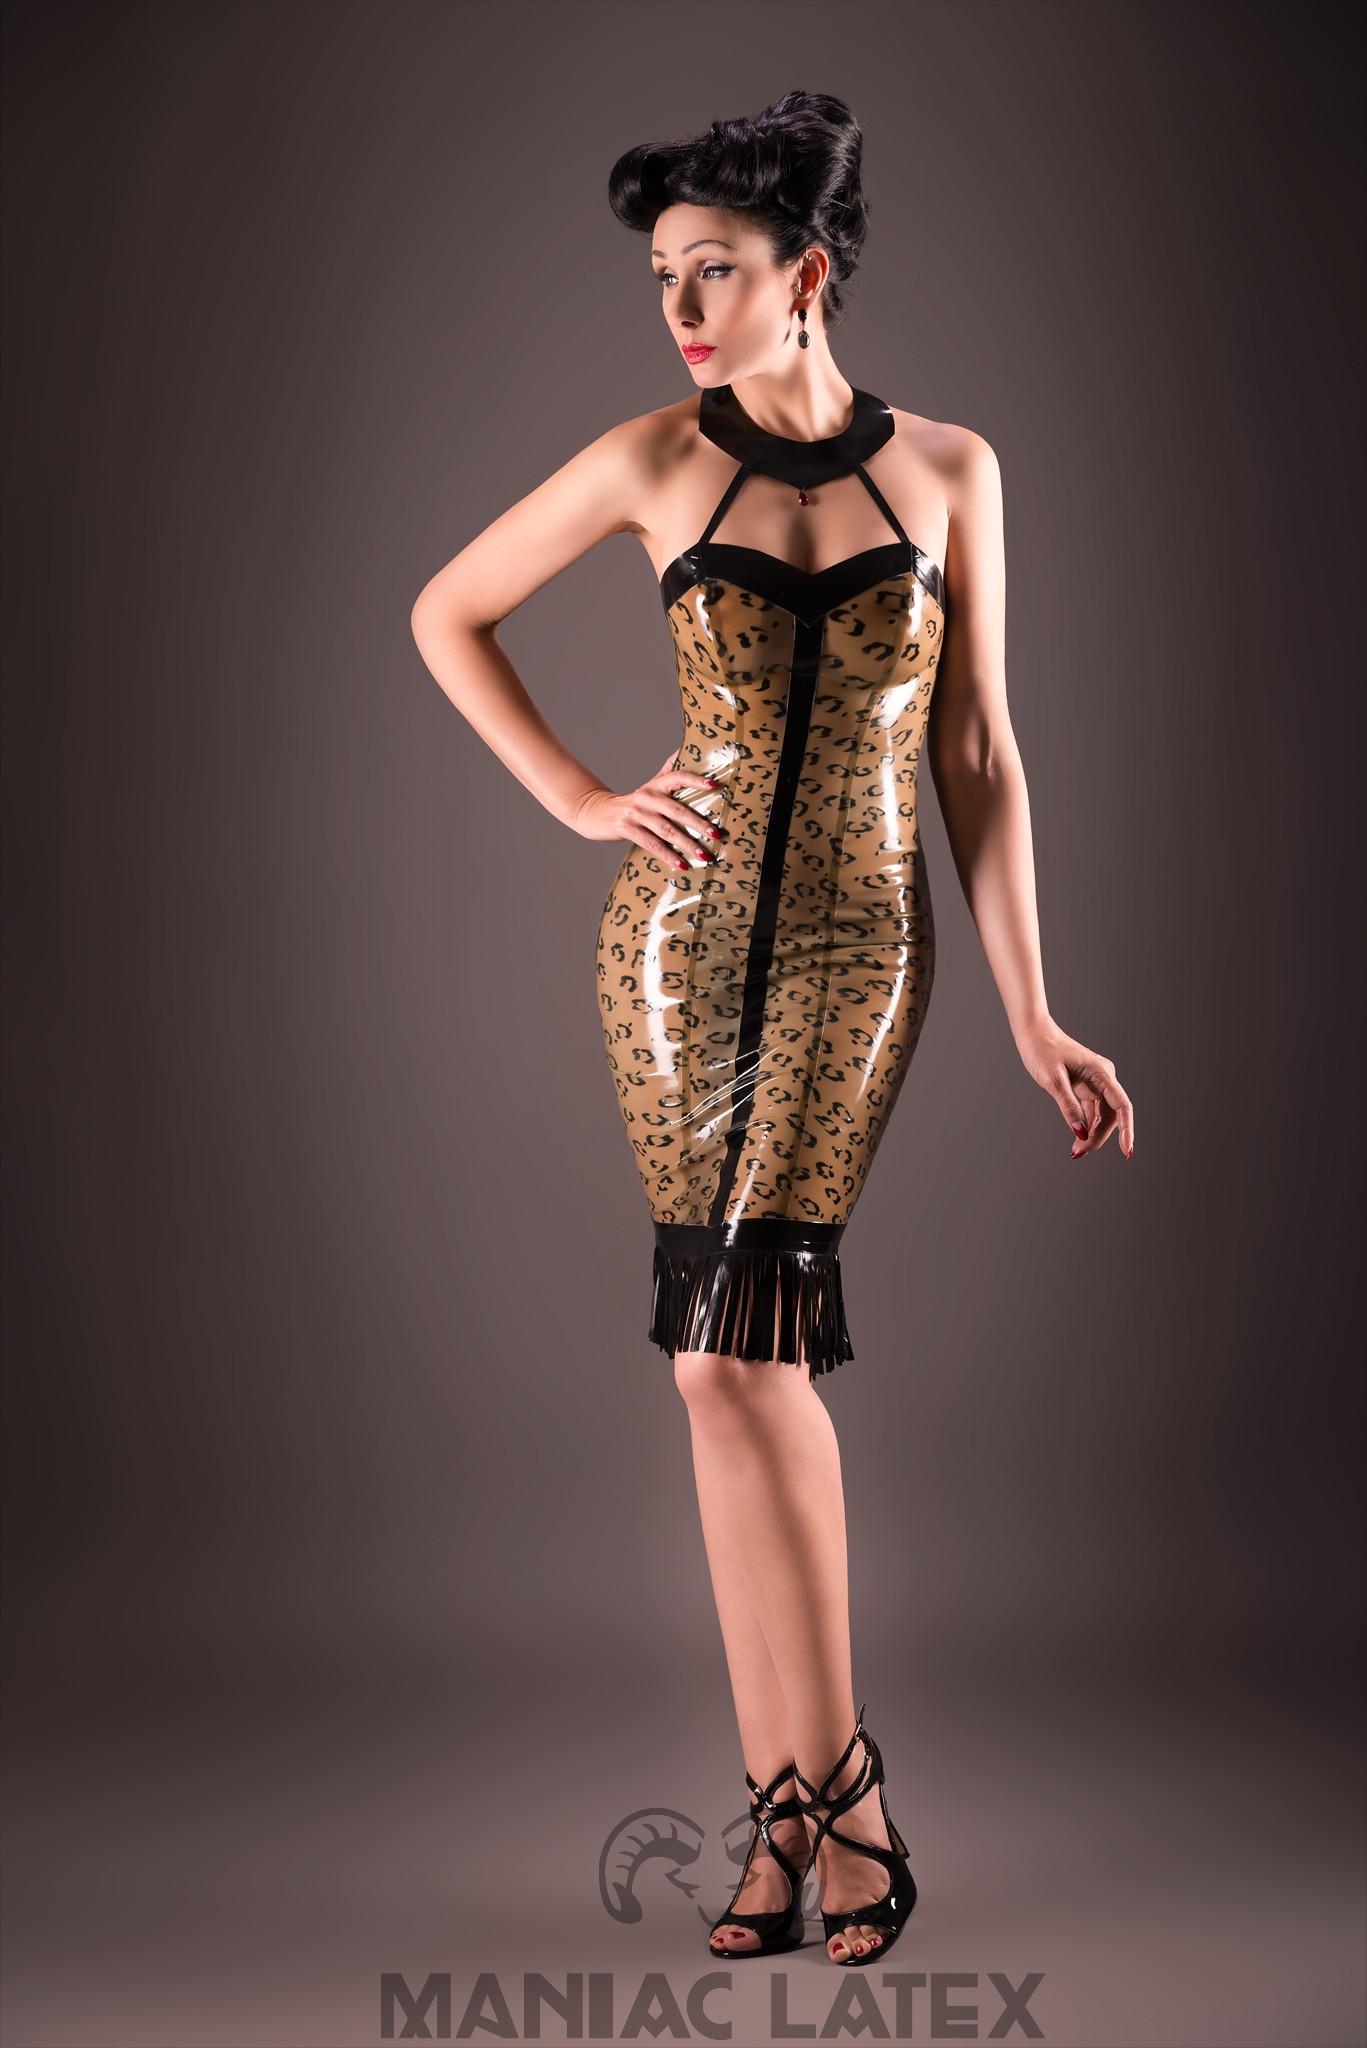 Arrow Dress (1)_Big City Life_Maniac Latex